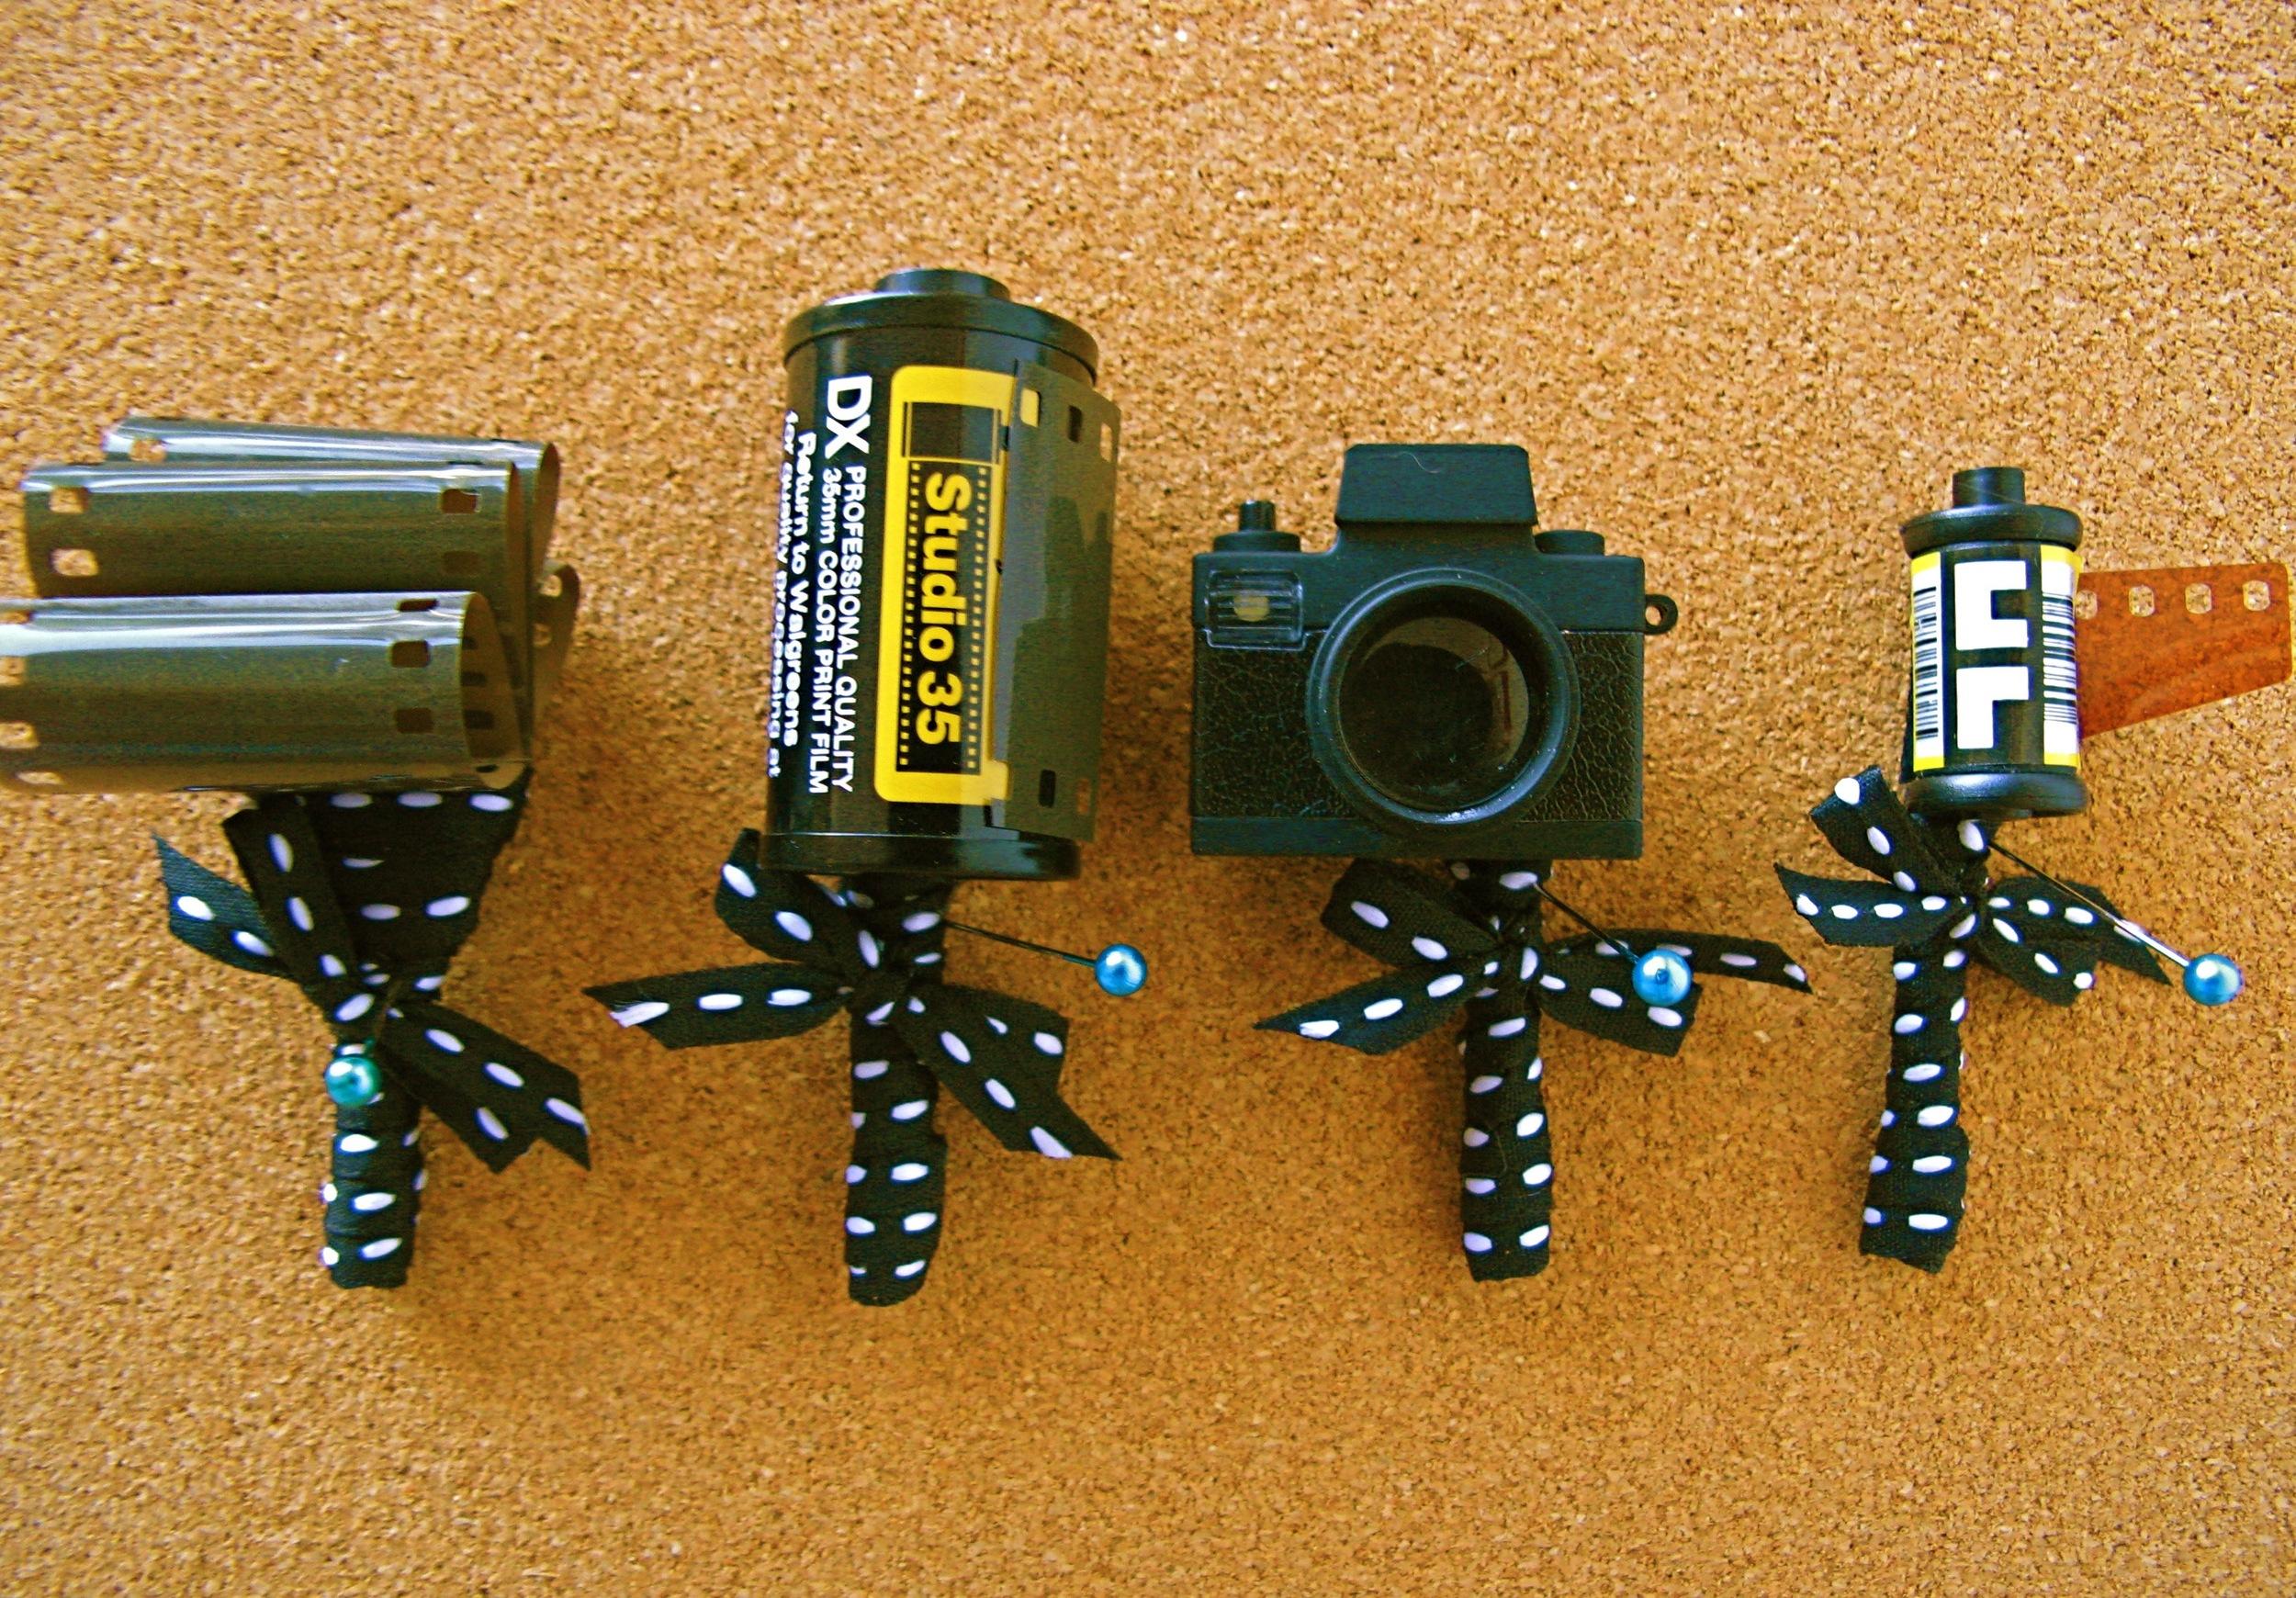 camera/film boutonniere